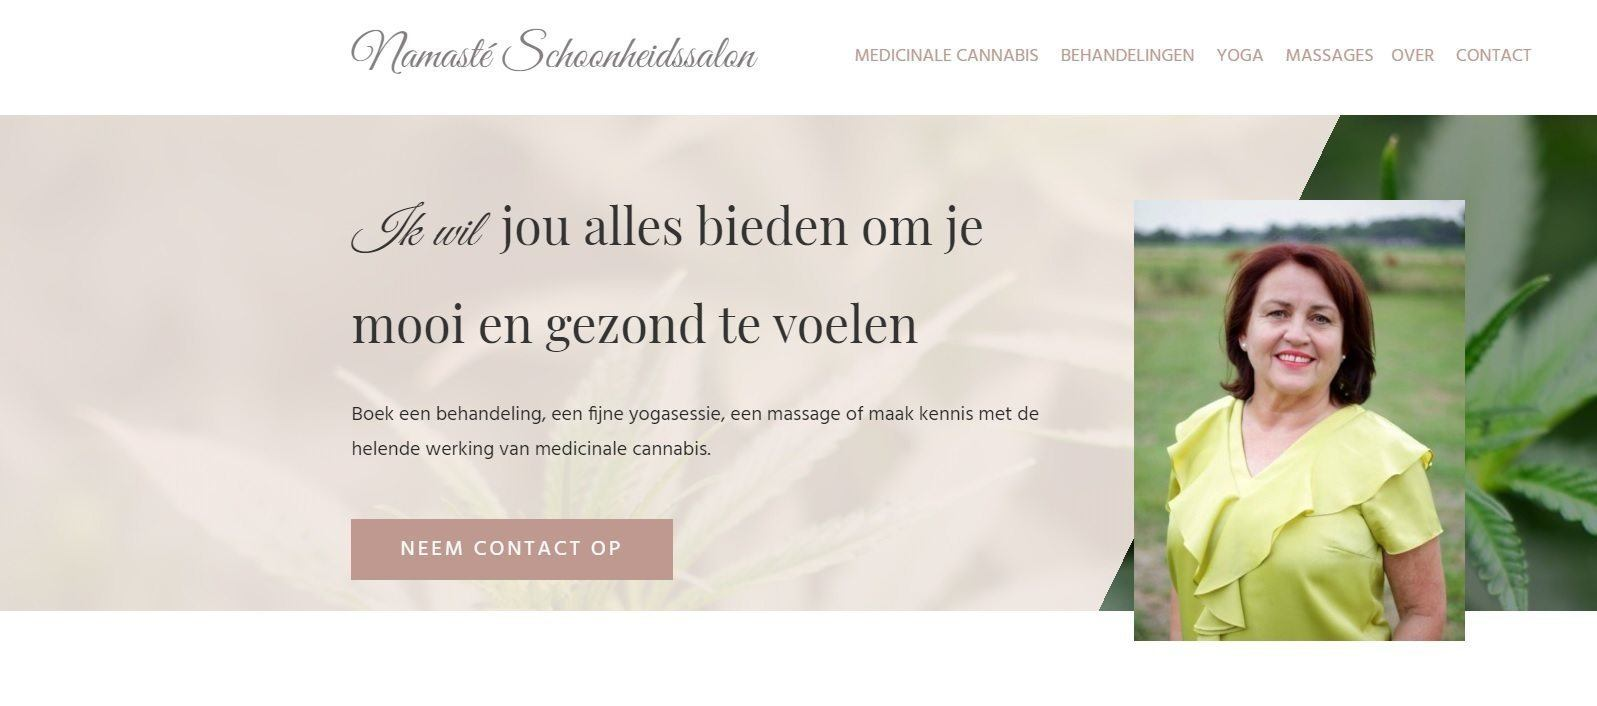 Website namaste